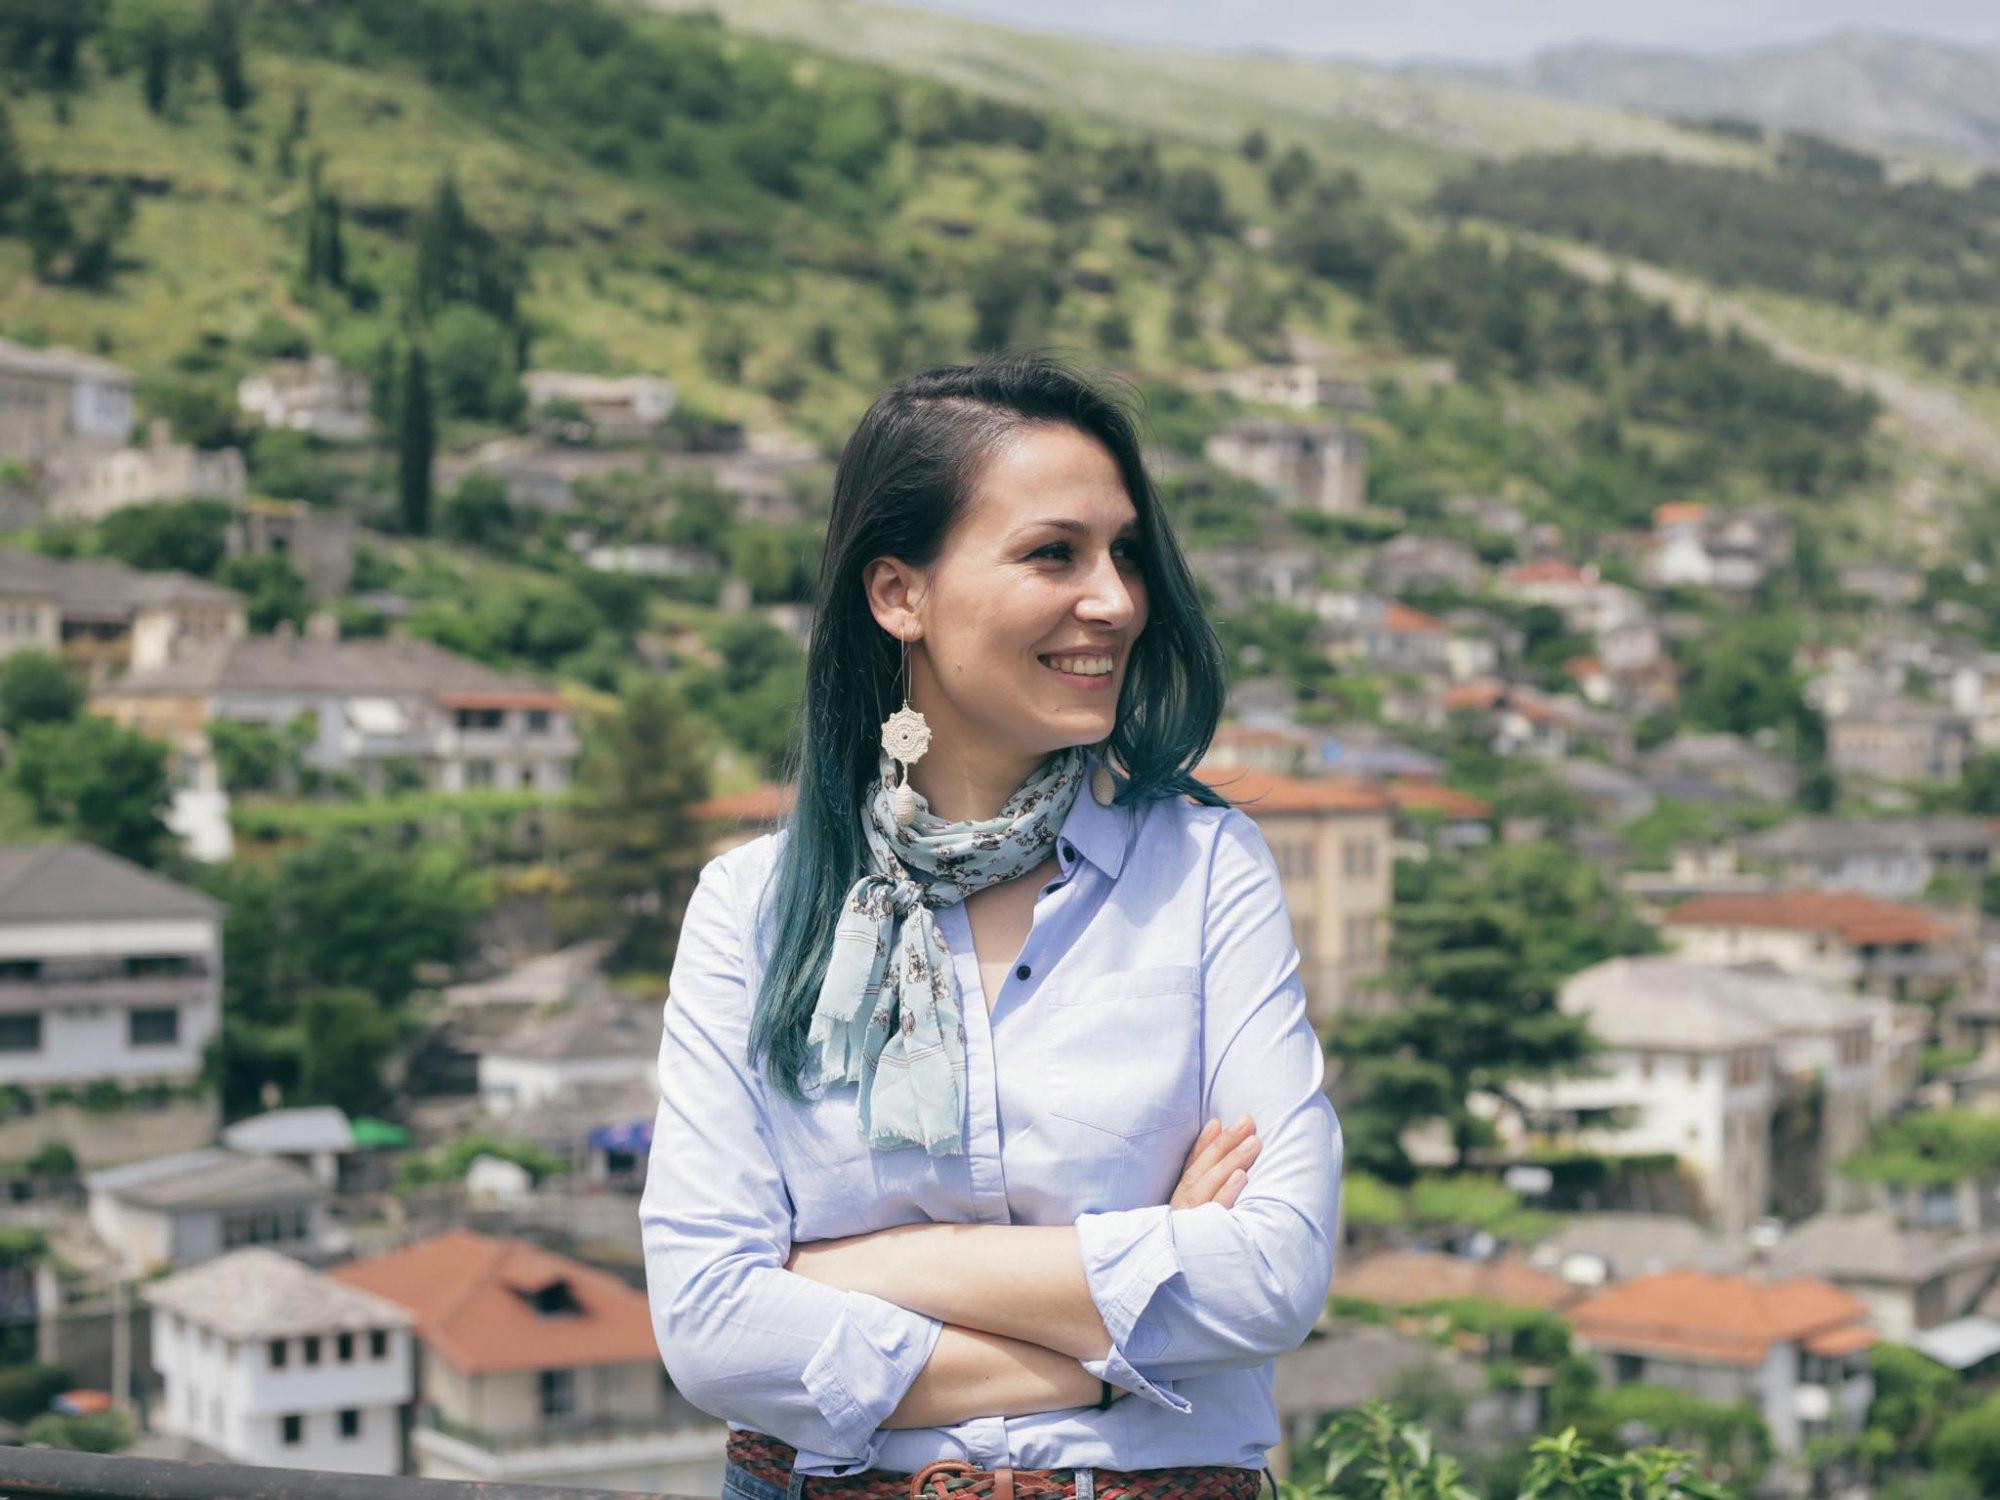 people_of_albania-19.jpg